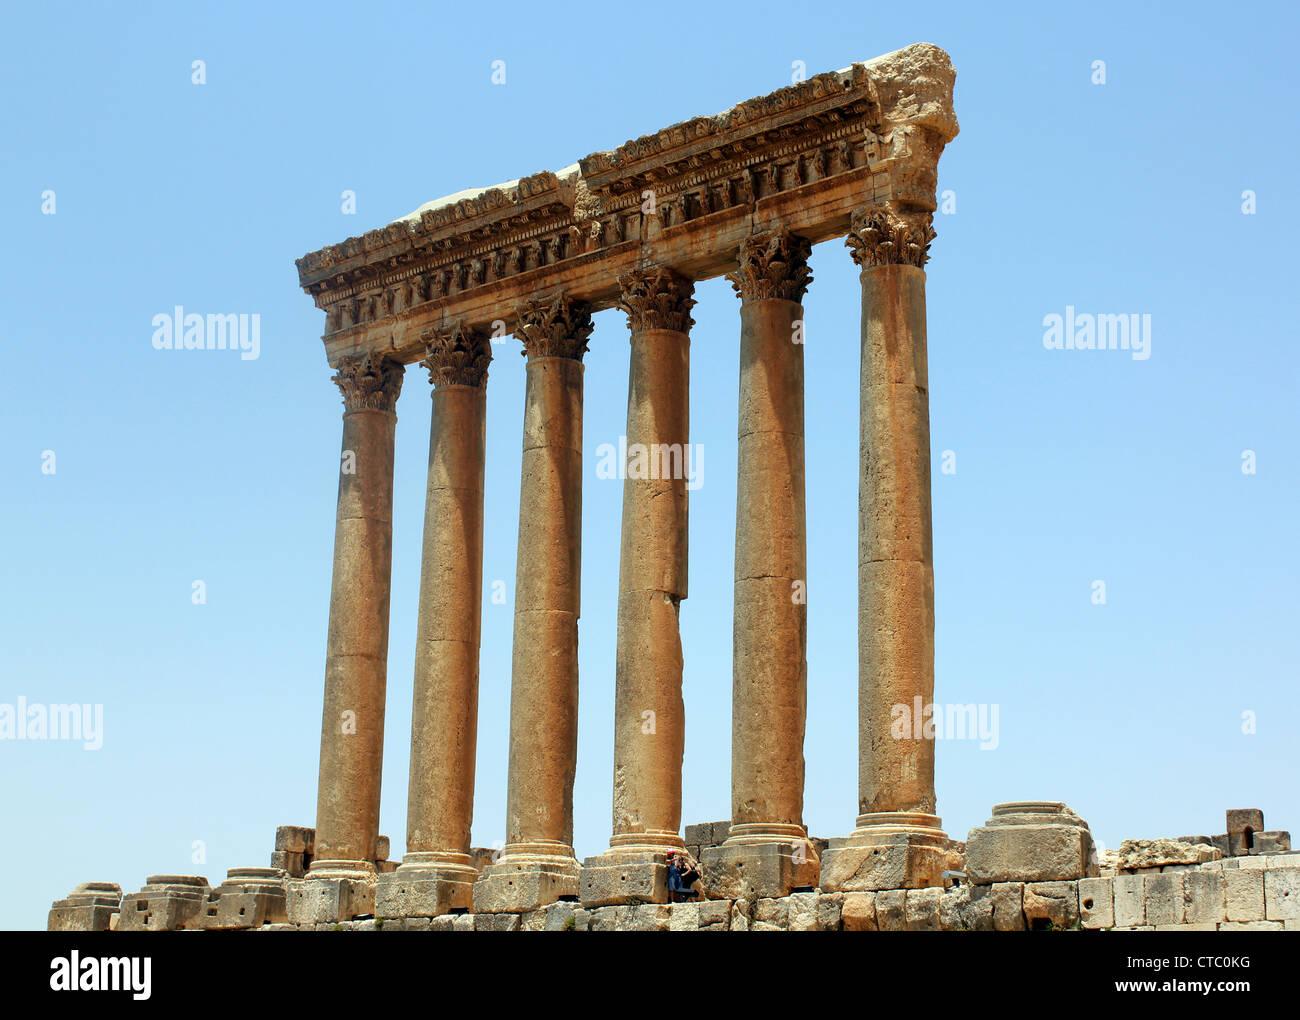 Baalbek Roman Ruins, Lebanon - Stock Image